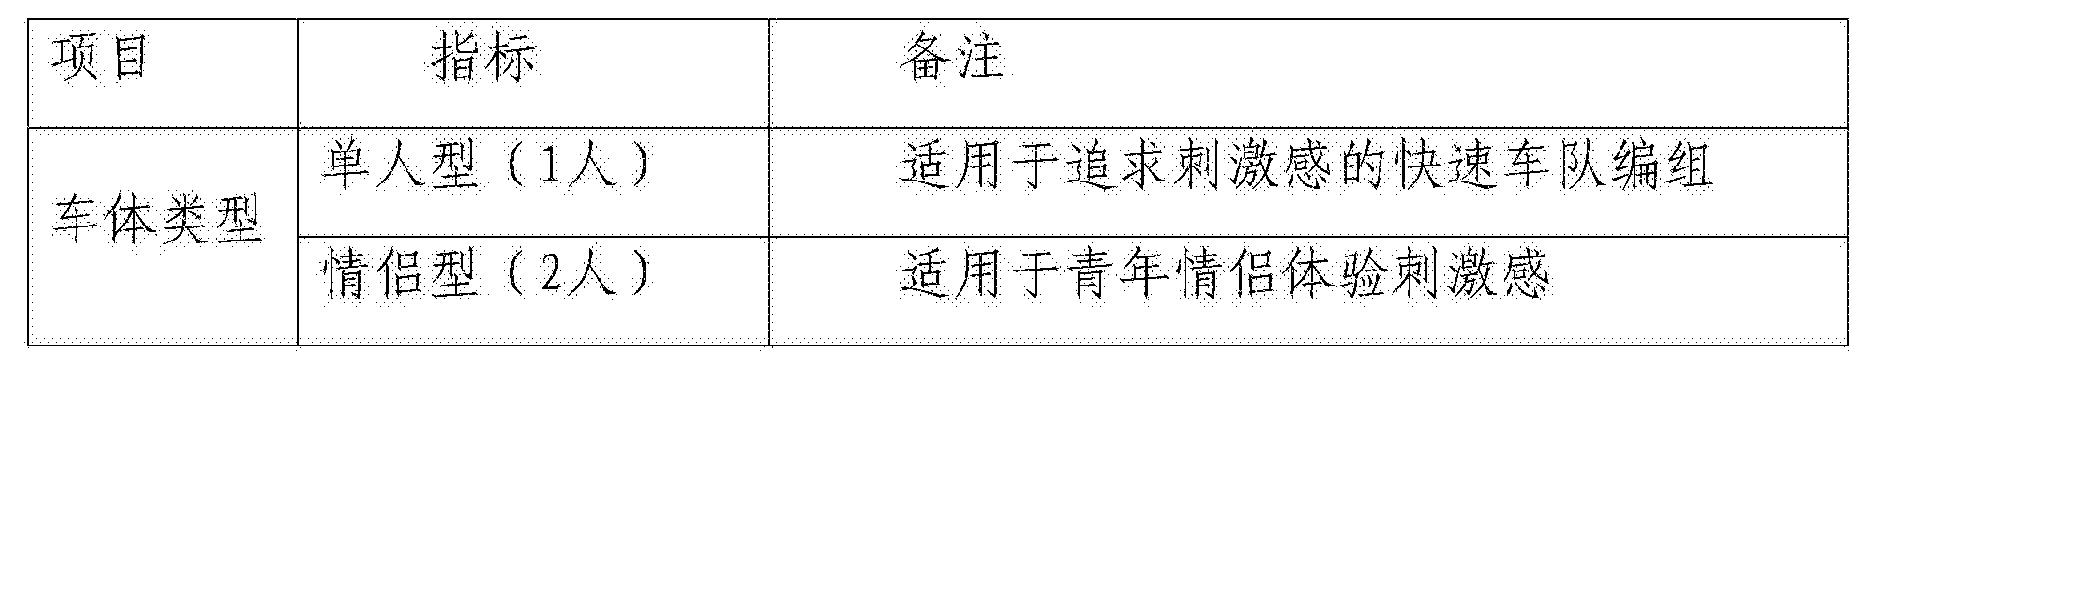 Figure CN106891901AD00061